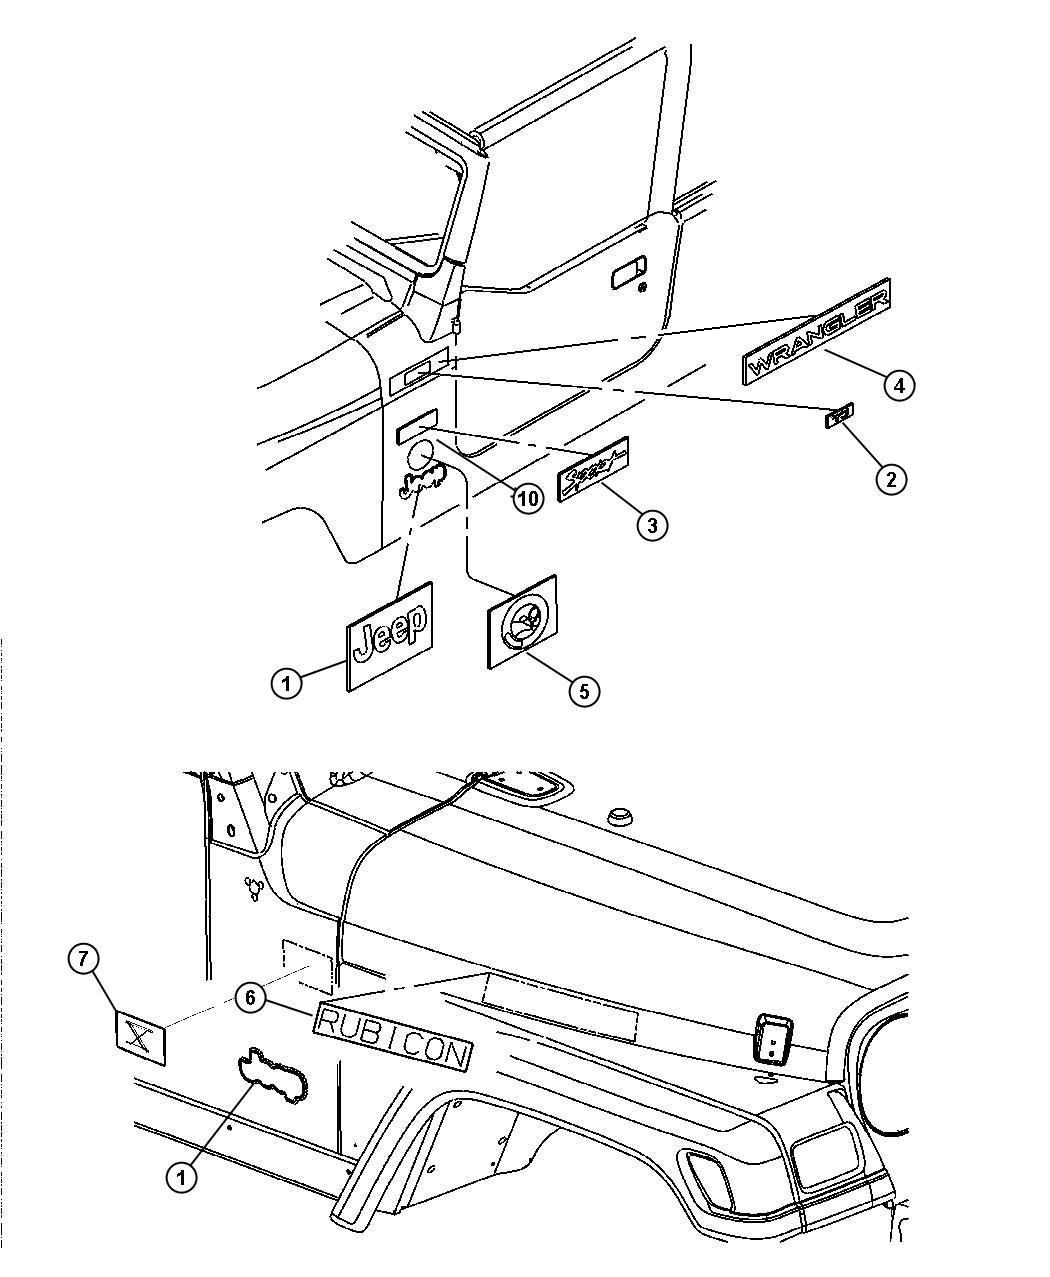 Jeep Wrangler Decal No Description Available Color